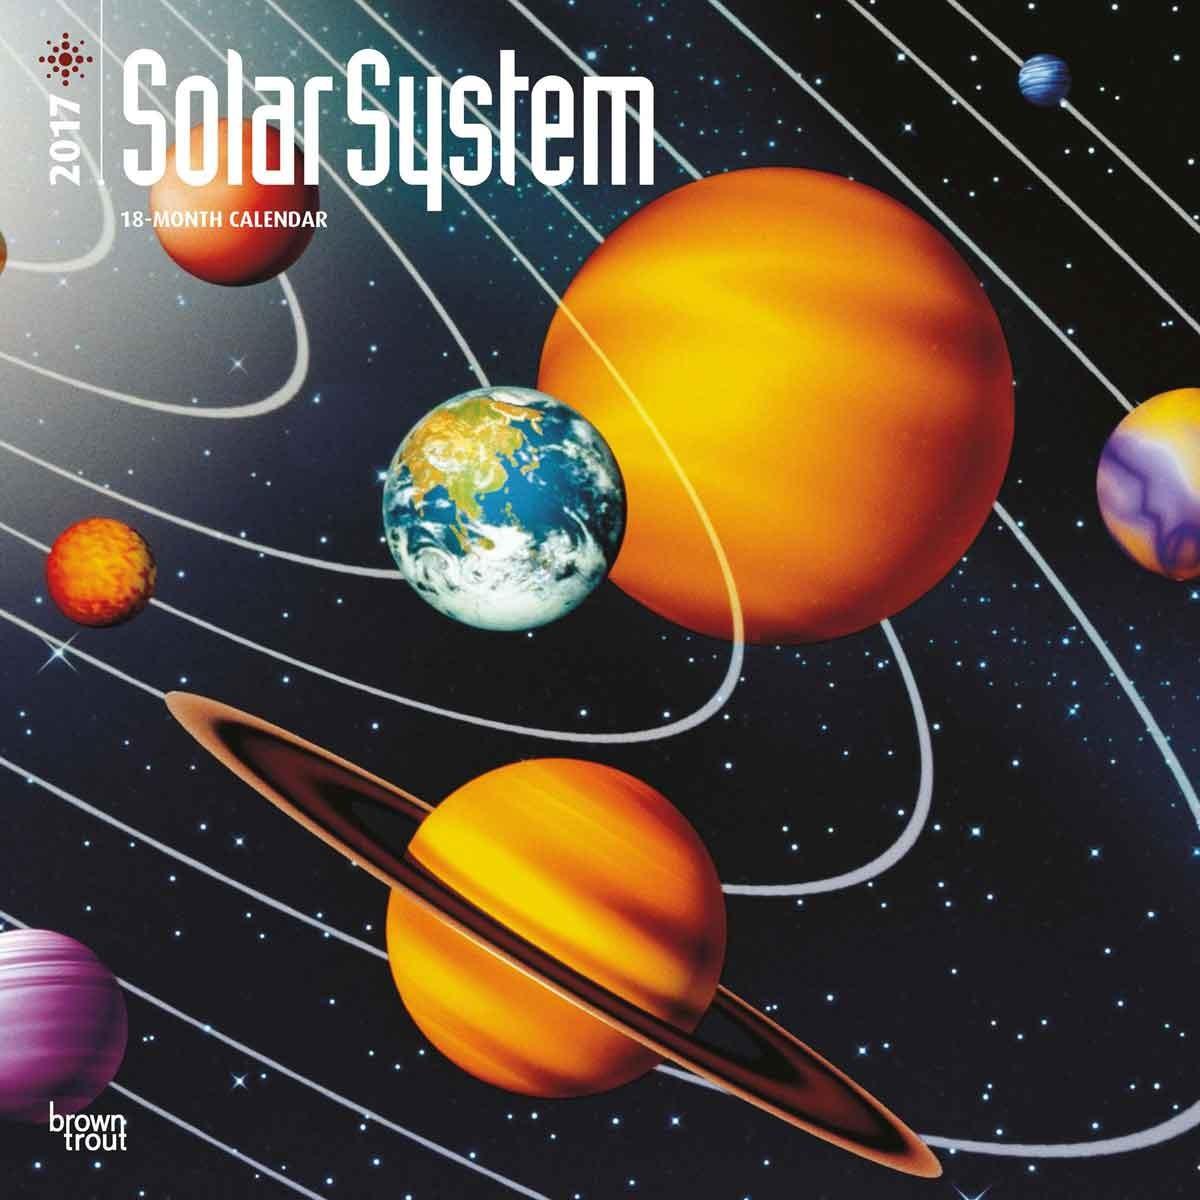 Calendario Solare 2020.Calendario Solare 2020 Calendario 2020